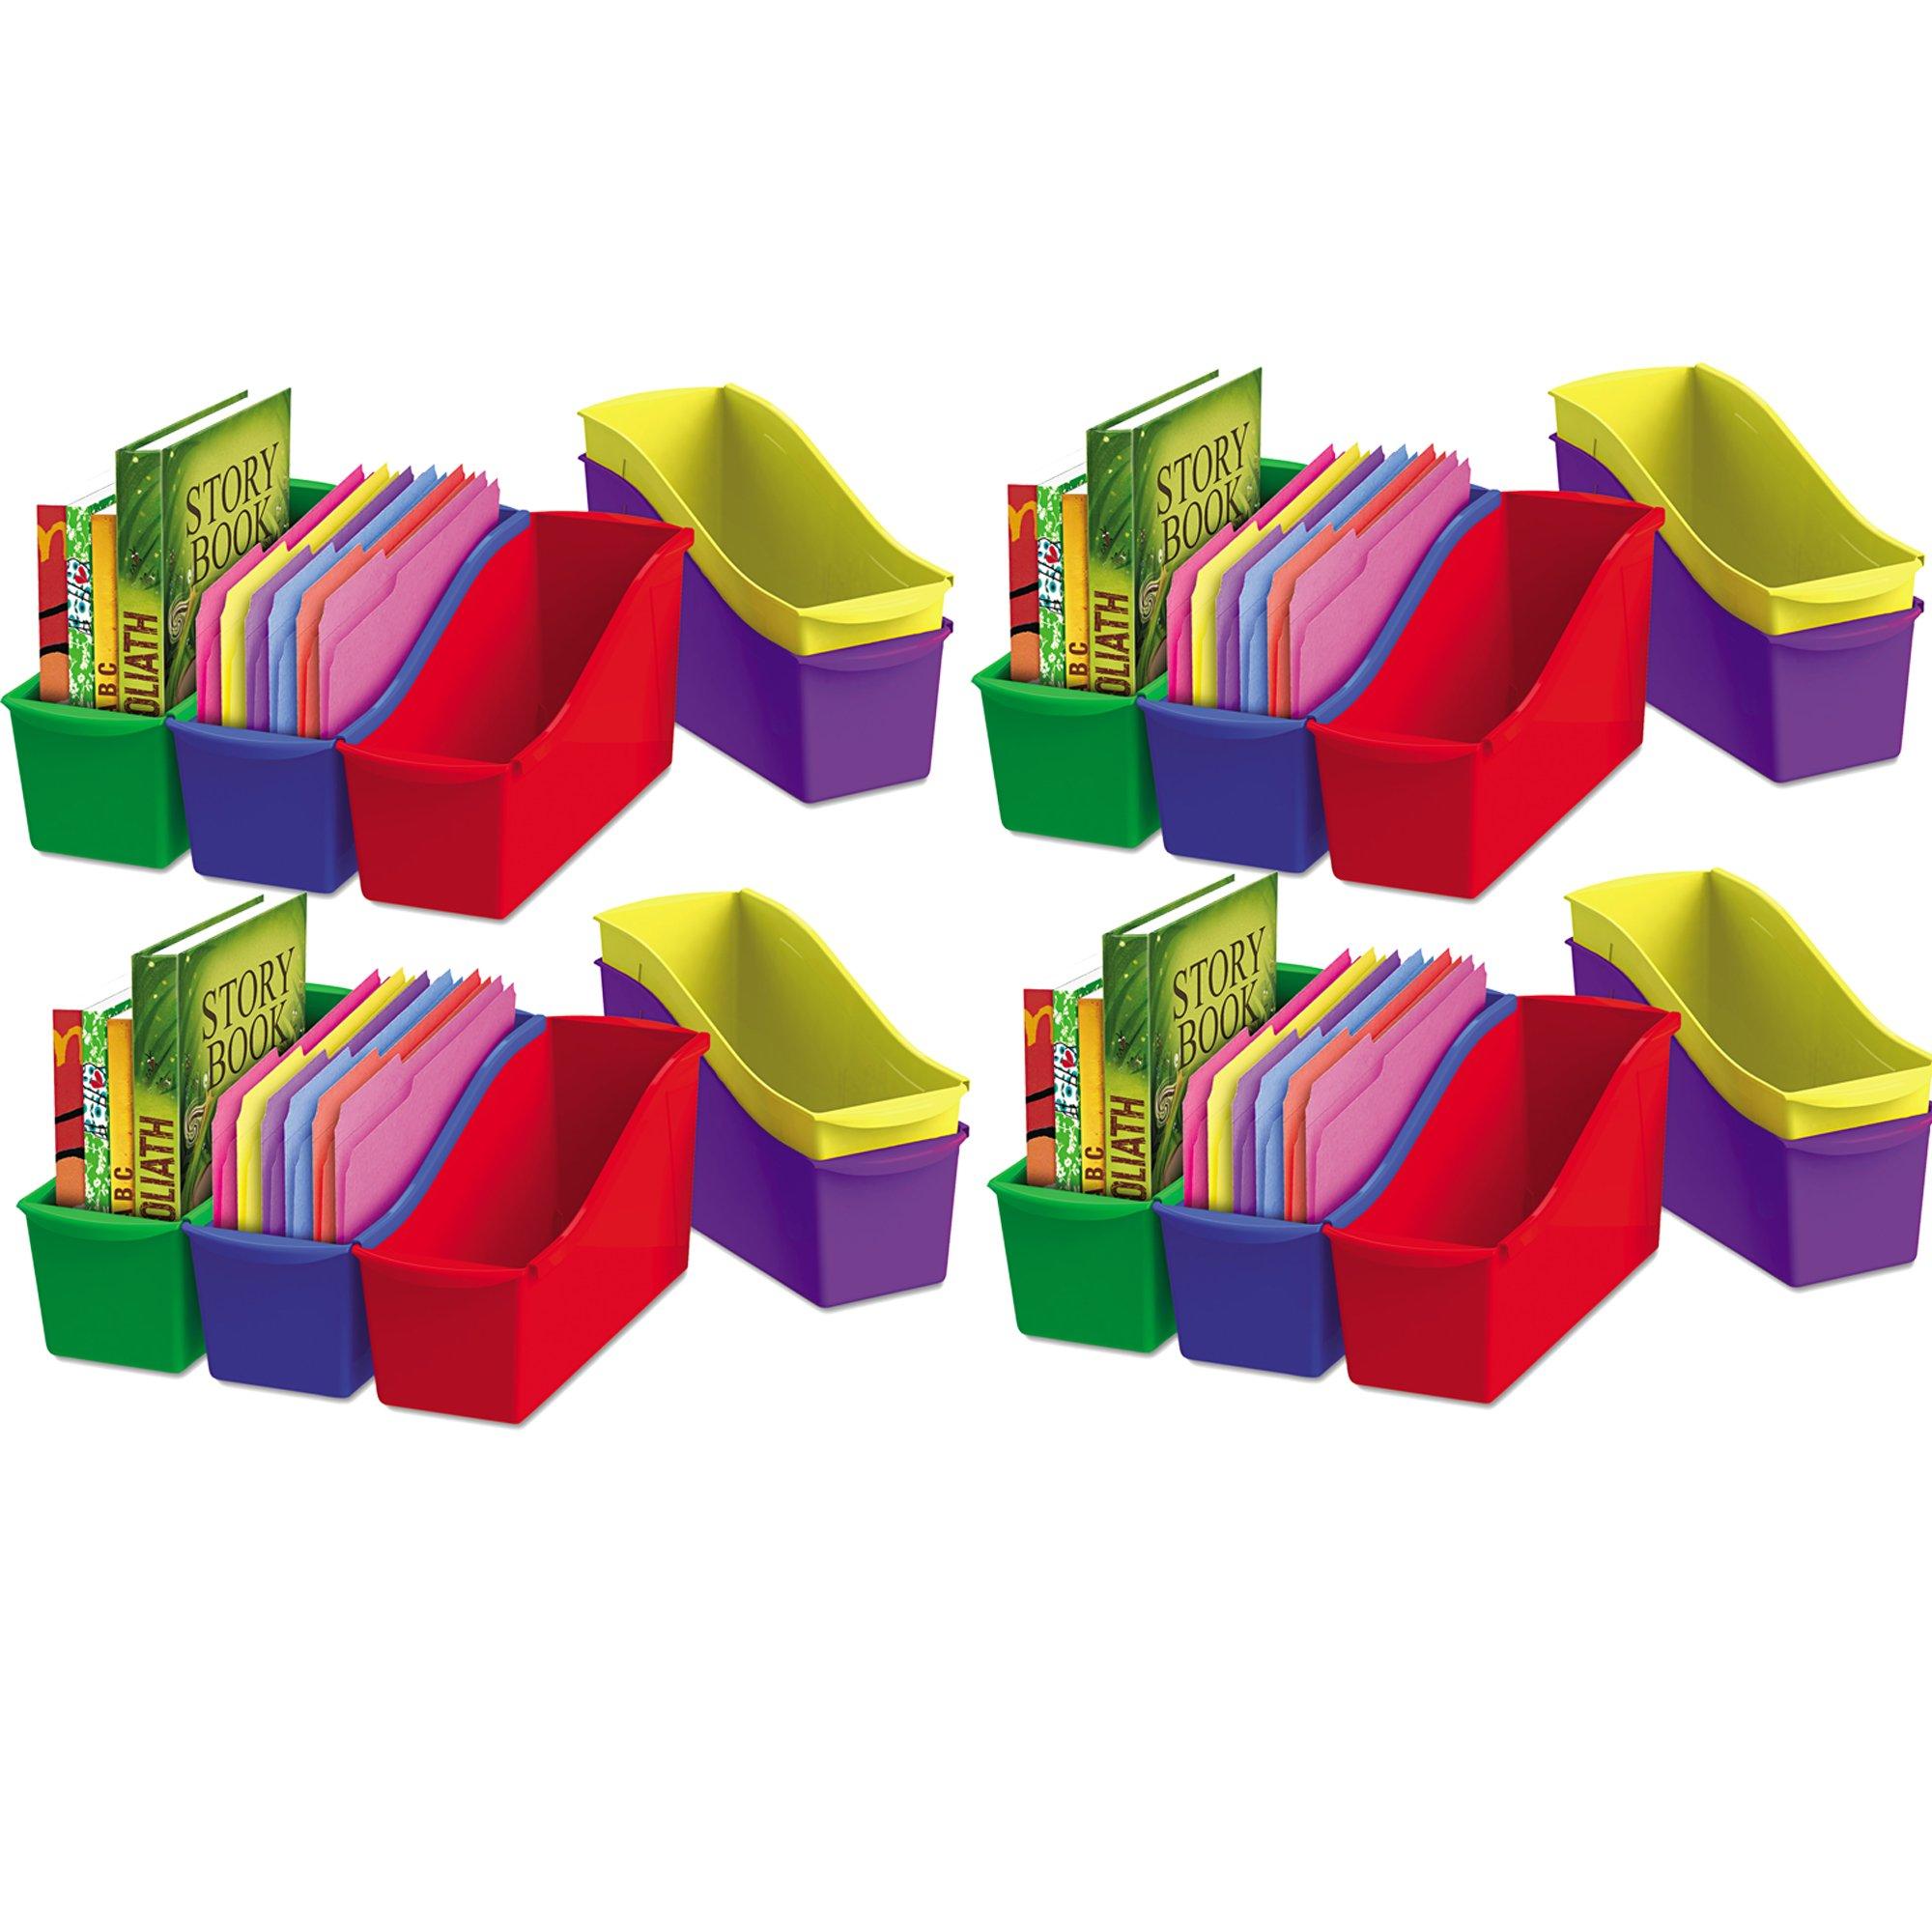 Storex Interlocking Book Bins, 5 1/3 W x 14 1/3 L x 7 H, 5 Color Set, Plastic (70105U06C), 4-Pack